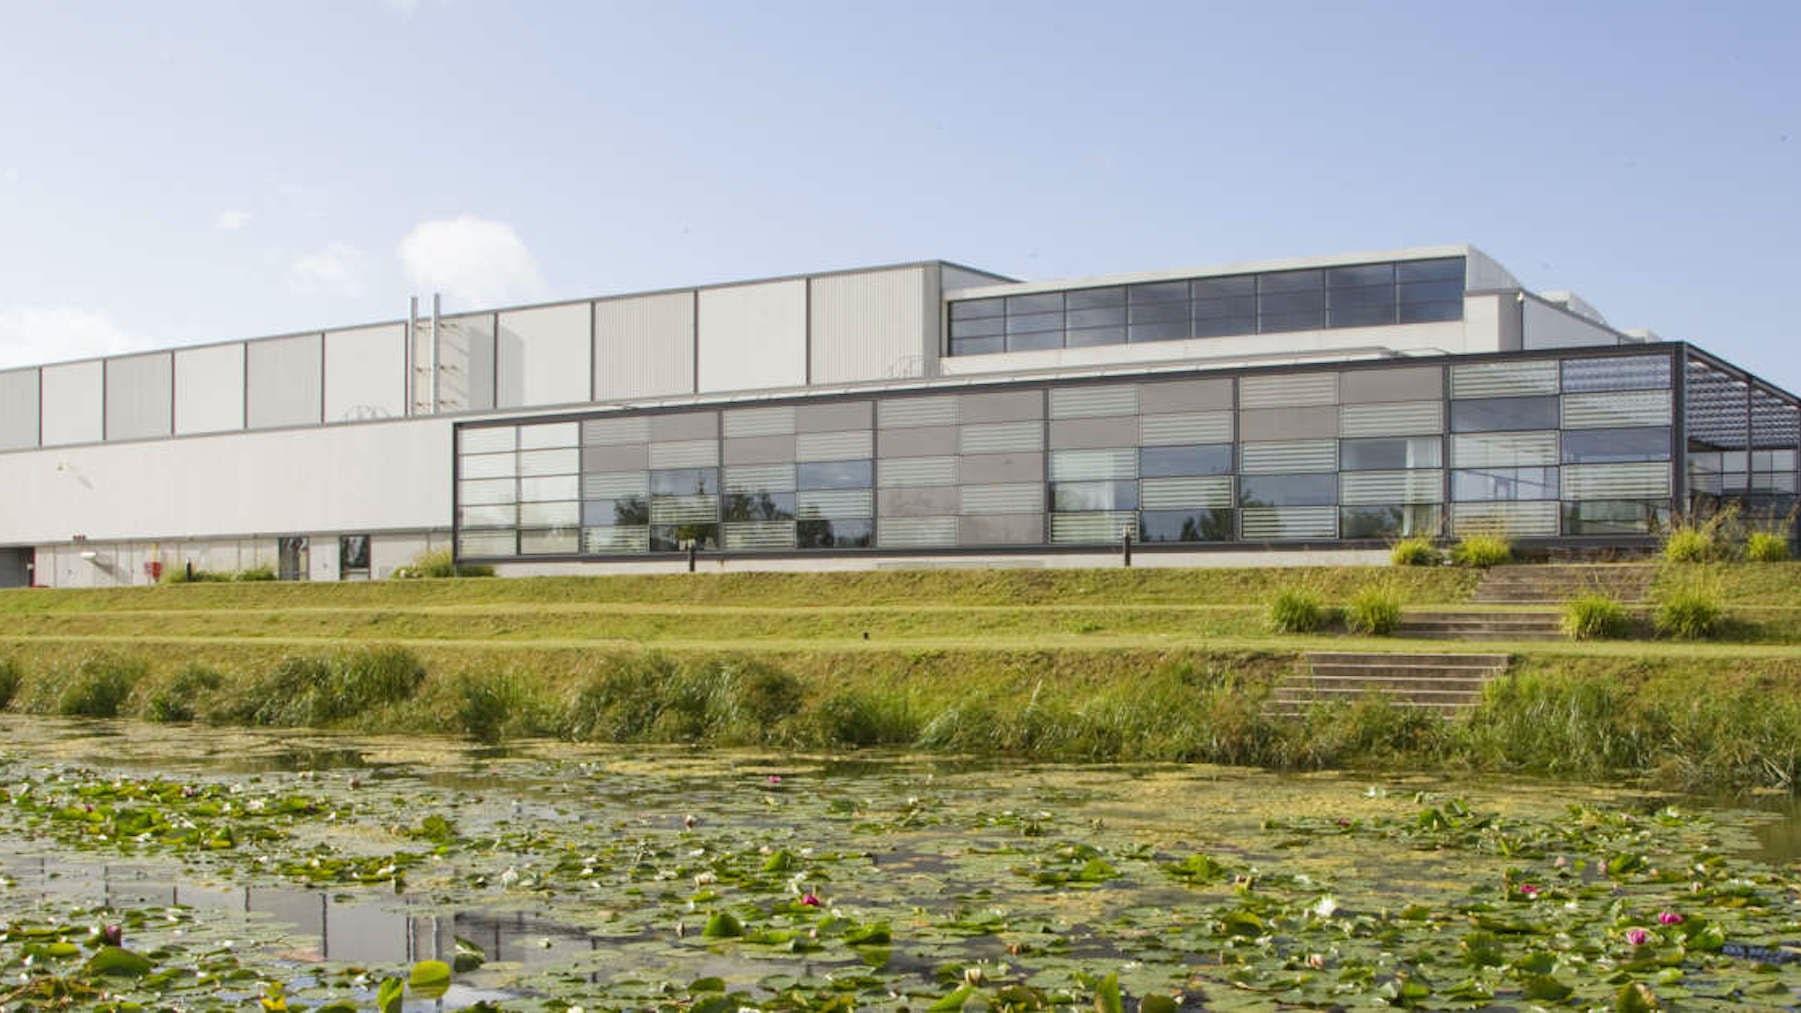 LVMH logistics centre, Eole, France | Source: Louis Vuitton Malletier/Mazen Saggar